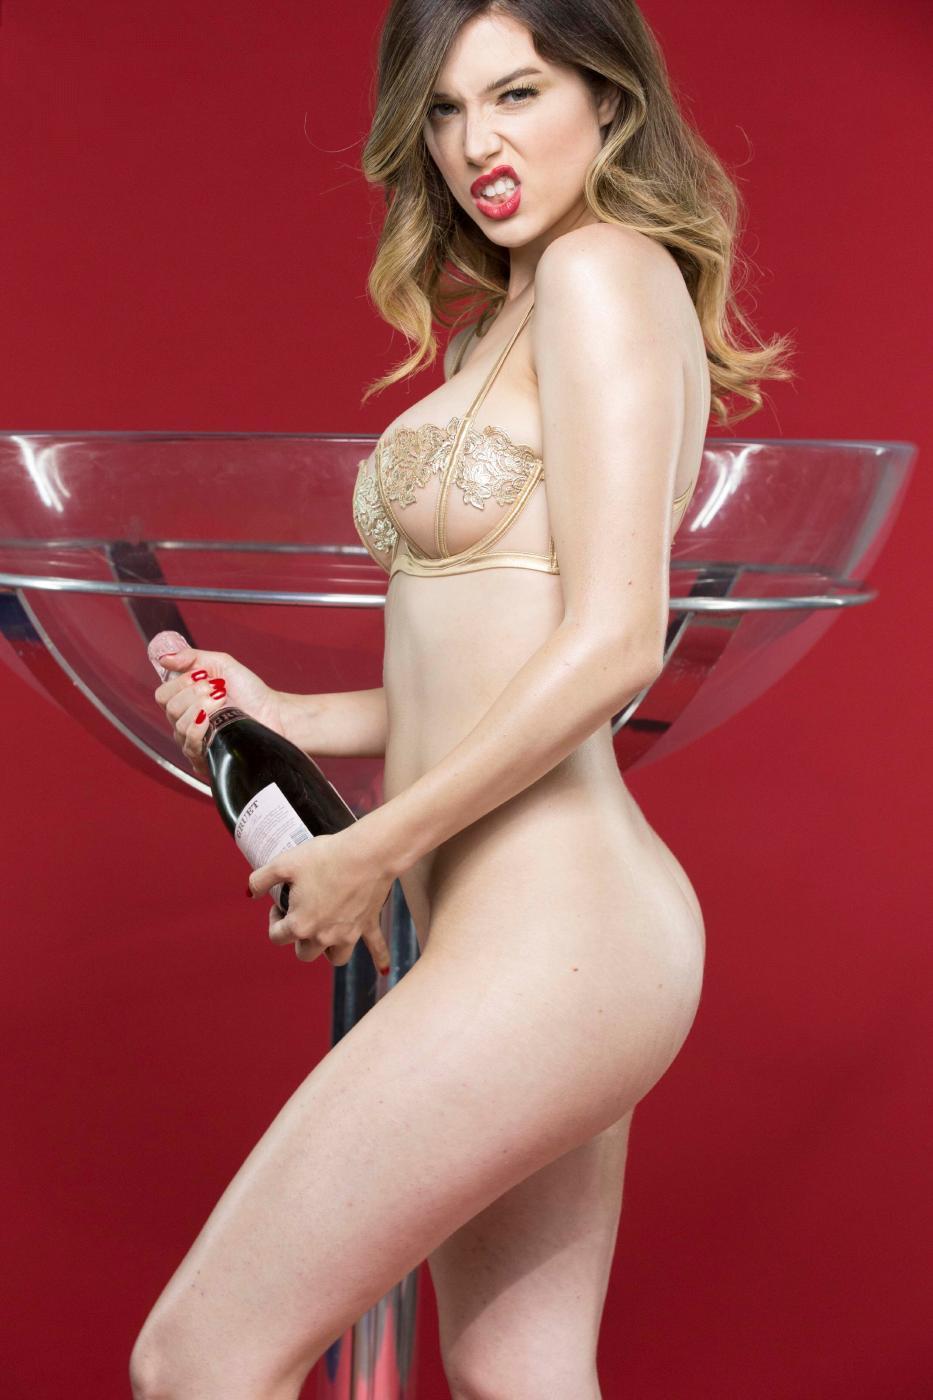 Lauren Summer Nude Playboy Photoshoot Leaked Nuqirj